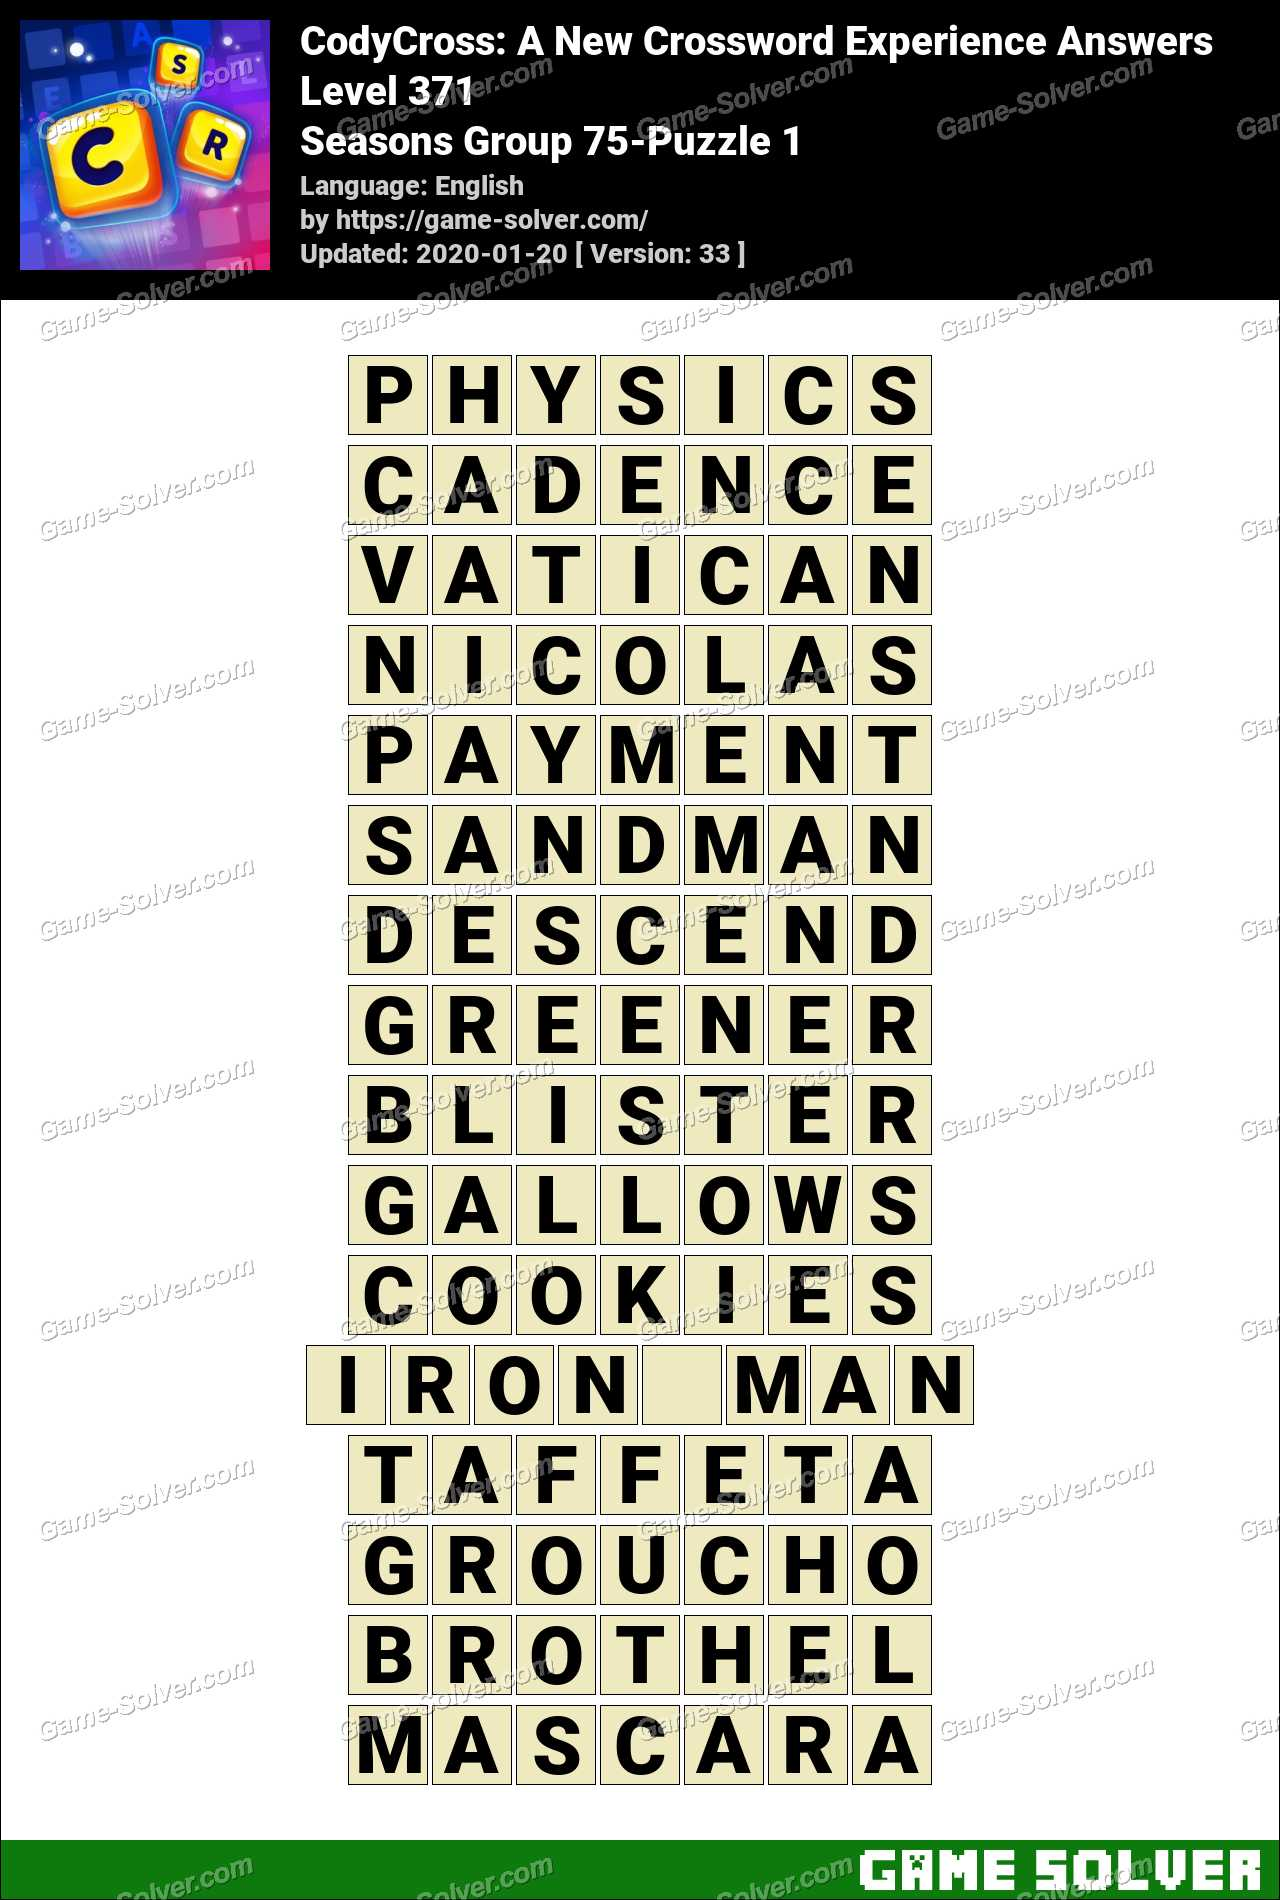 CodyCross Seasons Group 75-Puzzle 1 Answers